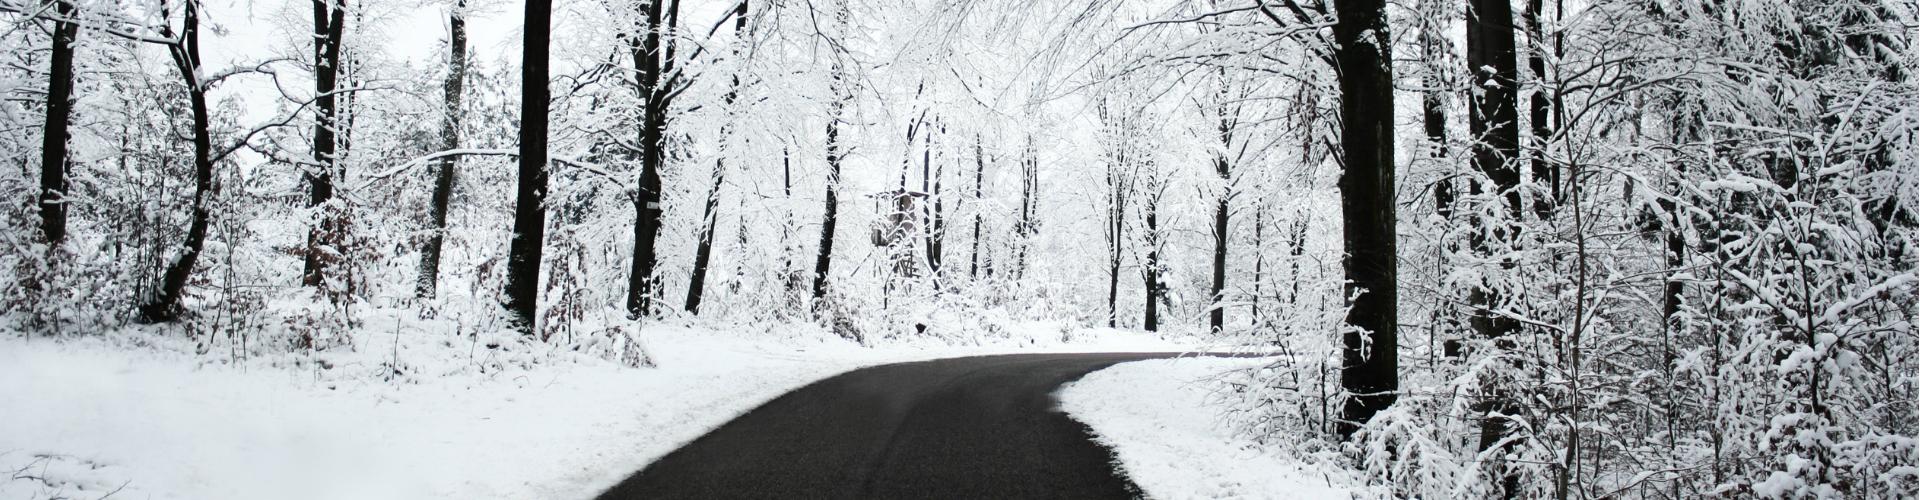 vinterree